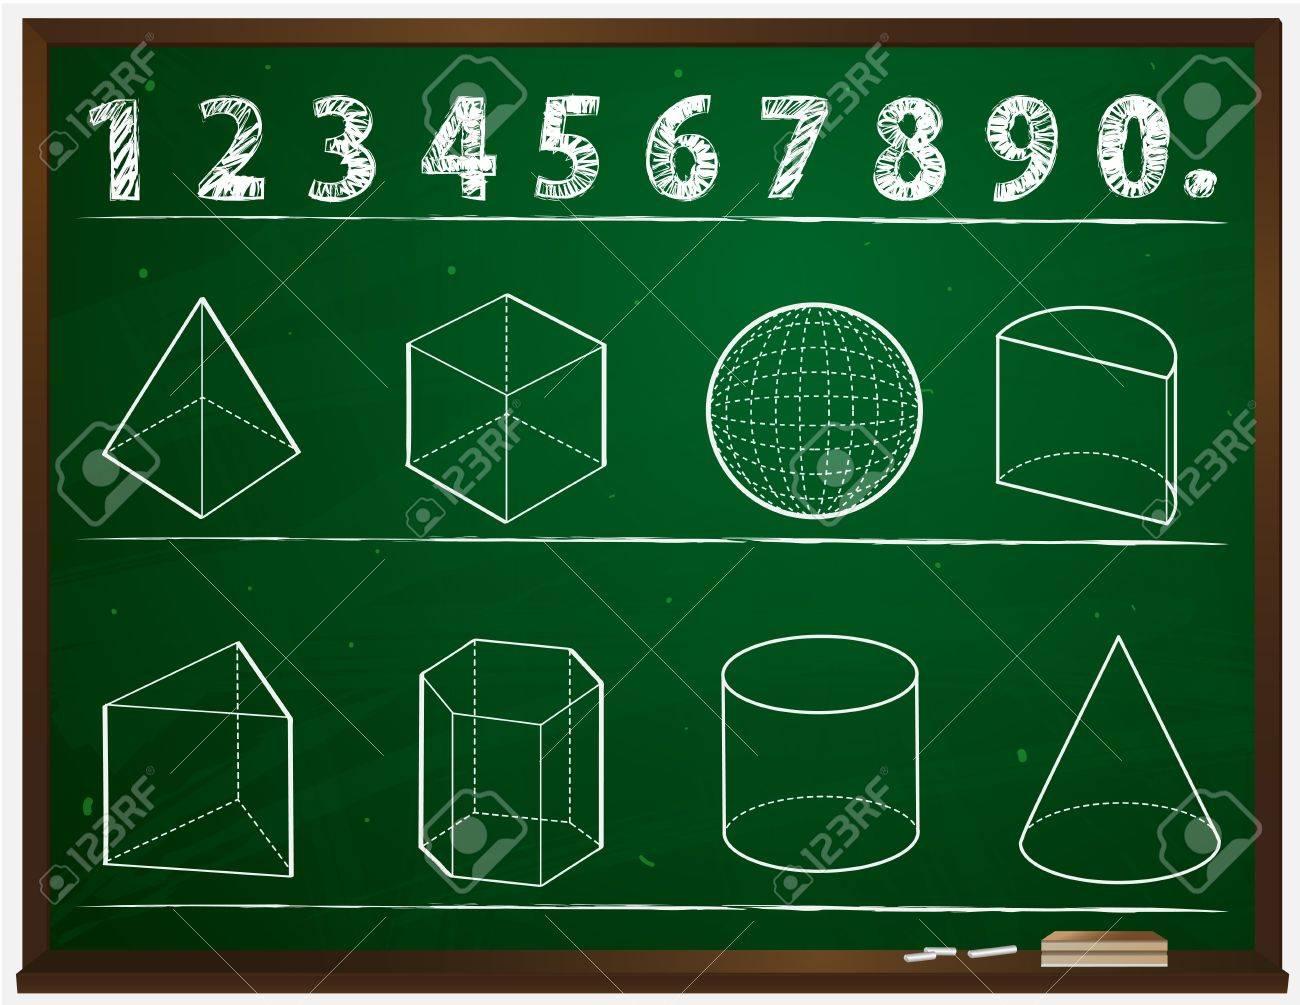 Geometry On The Blackboard Cartoon Royalty Free Cliparts, Vectors ...